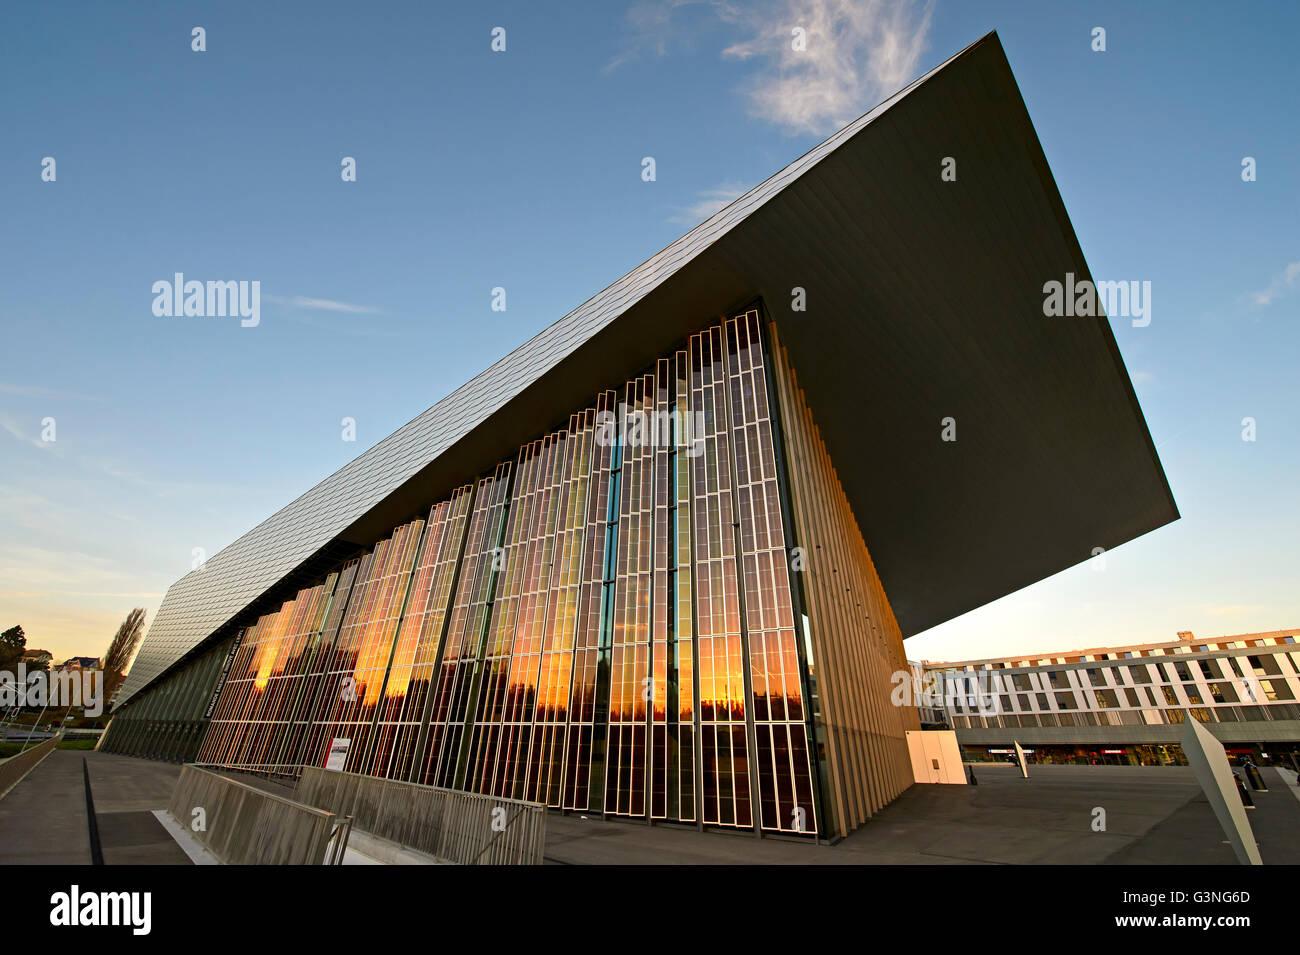 Organischen farbstoffsensibilisierten Solarzellen an der SwissTech Convention Center, École Polytechnique Fédérale Stockbild